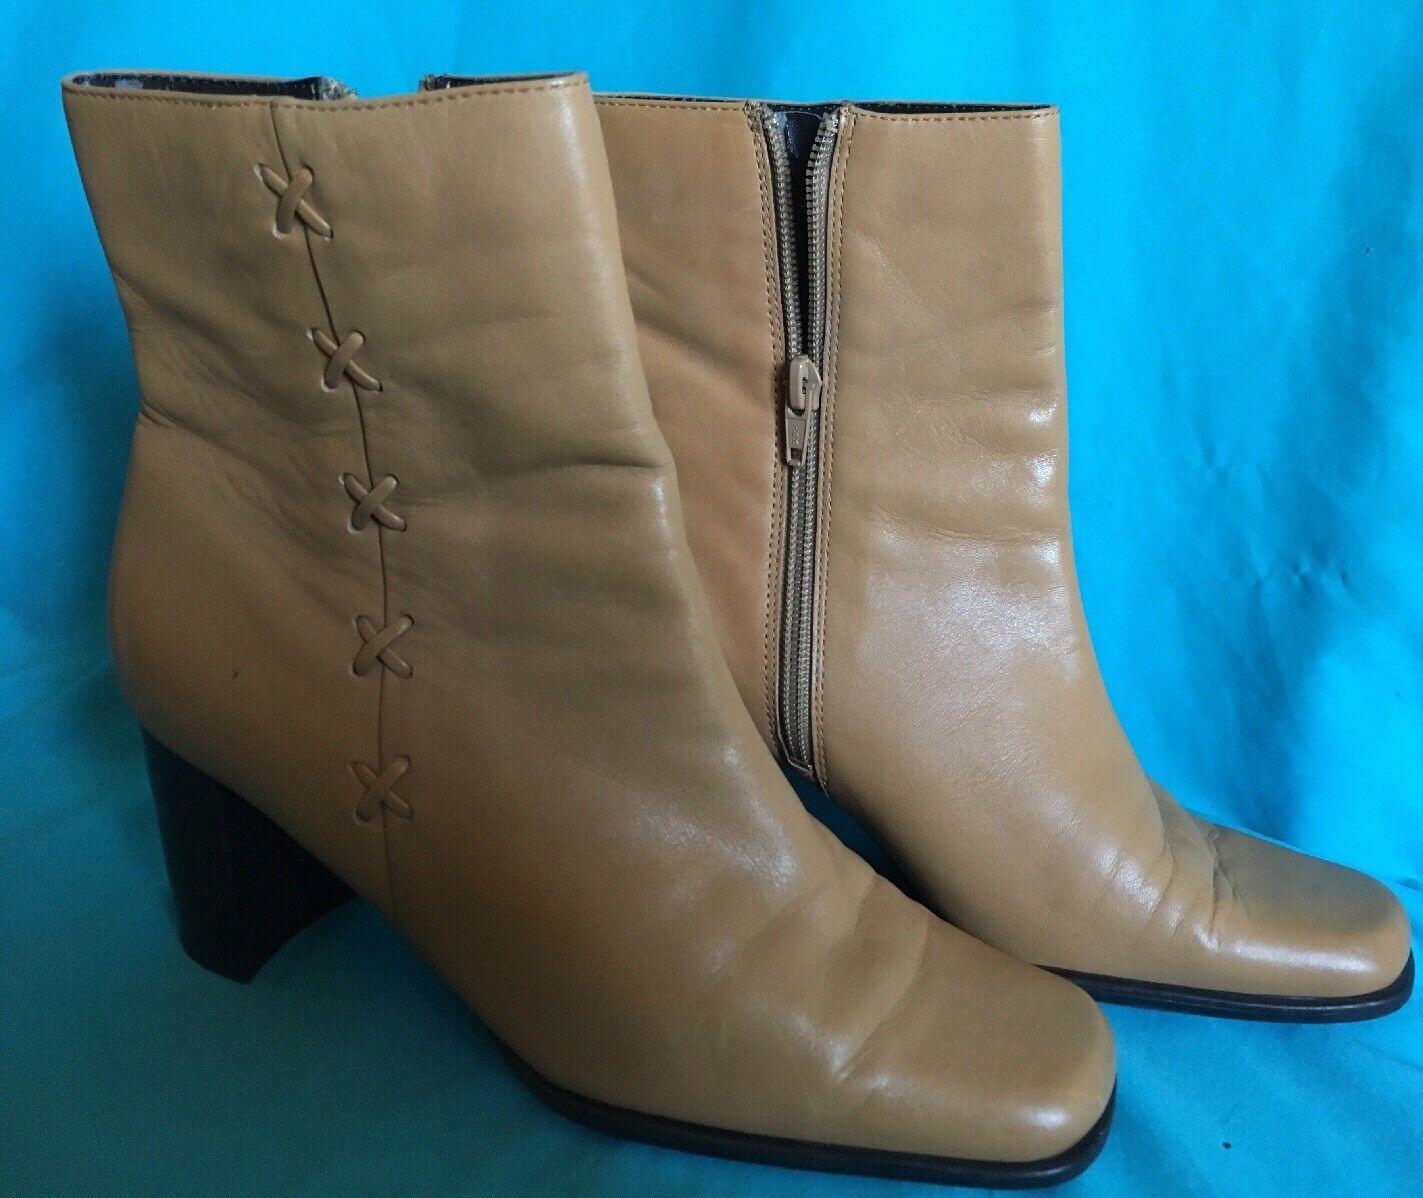 Worthington Cognac Leather Mid-Calf Fashion Chunky Heel Boots 8M Zip/Stitch